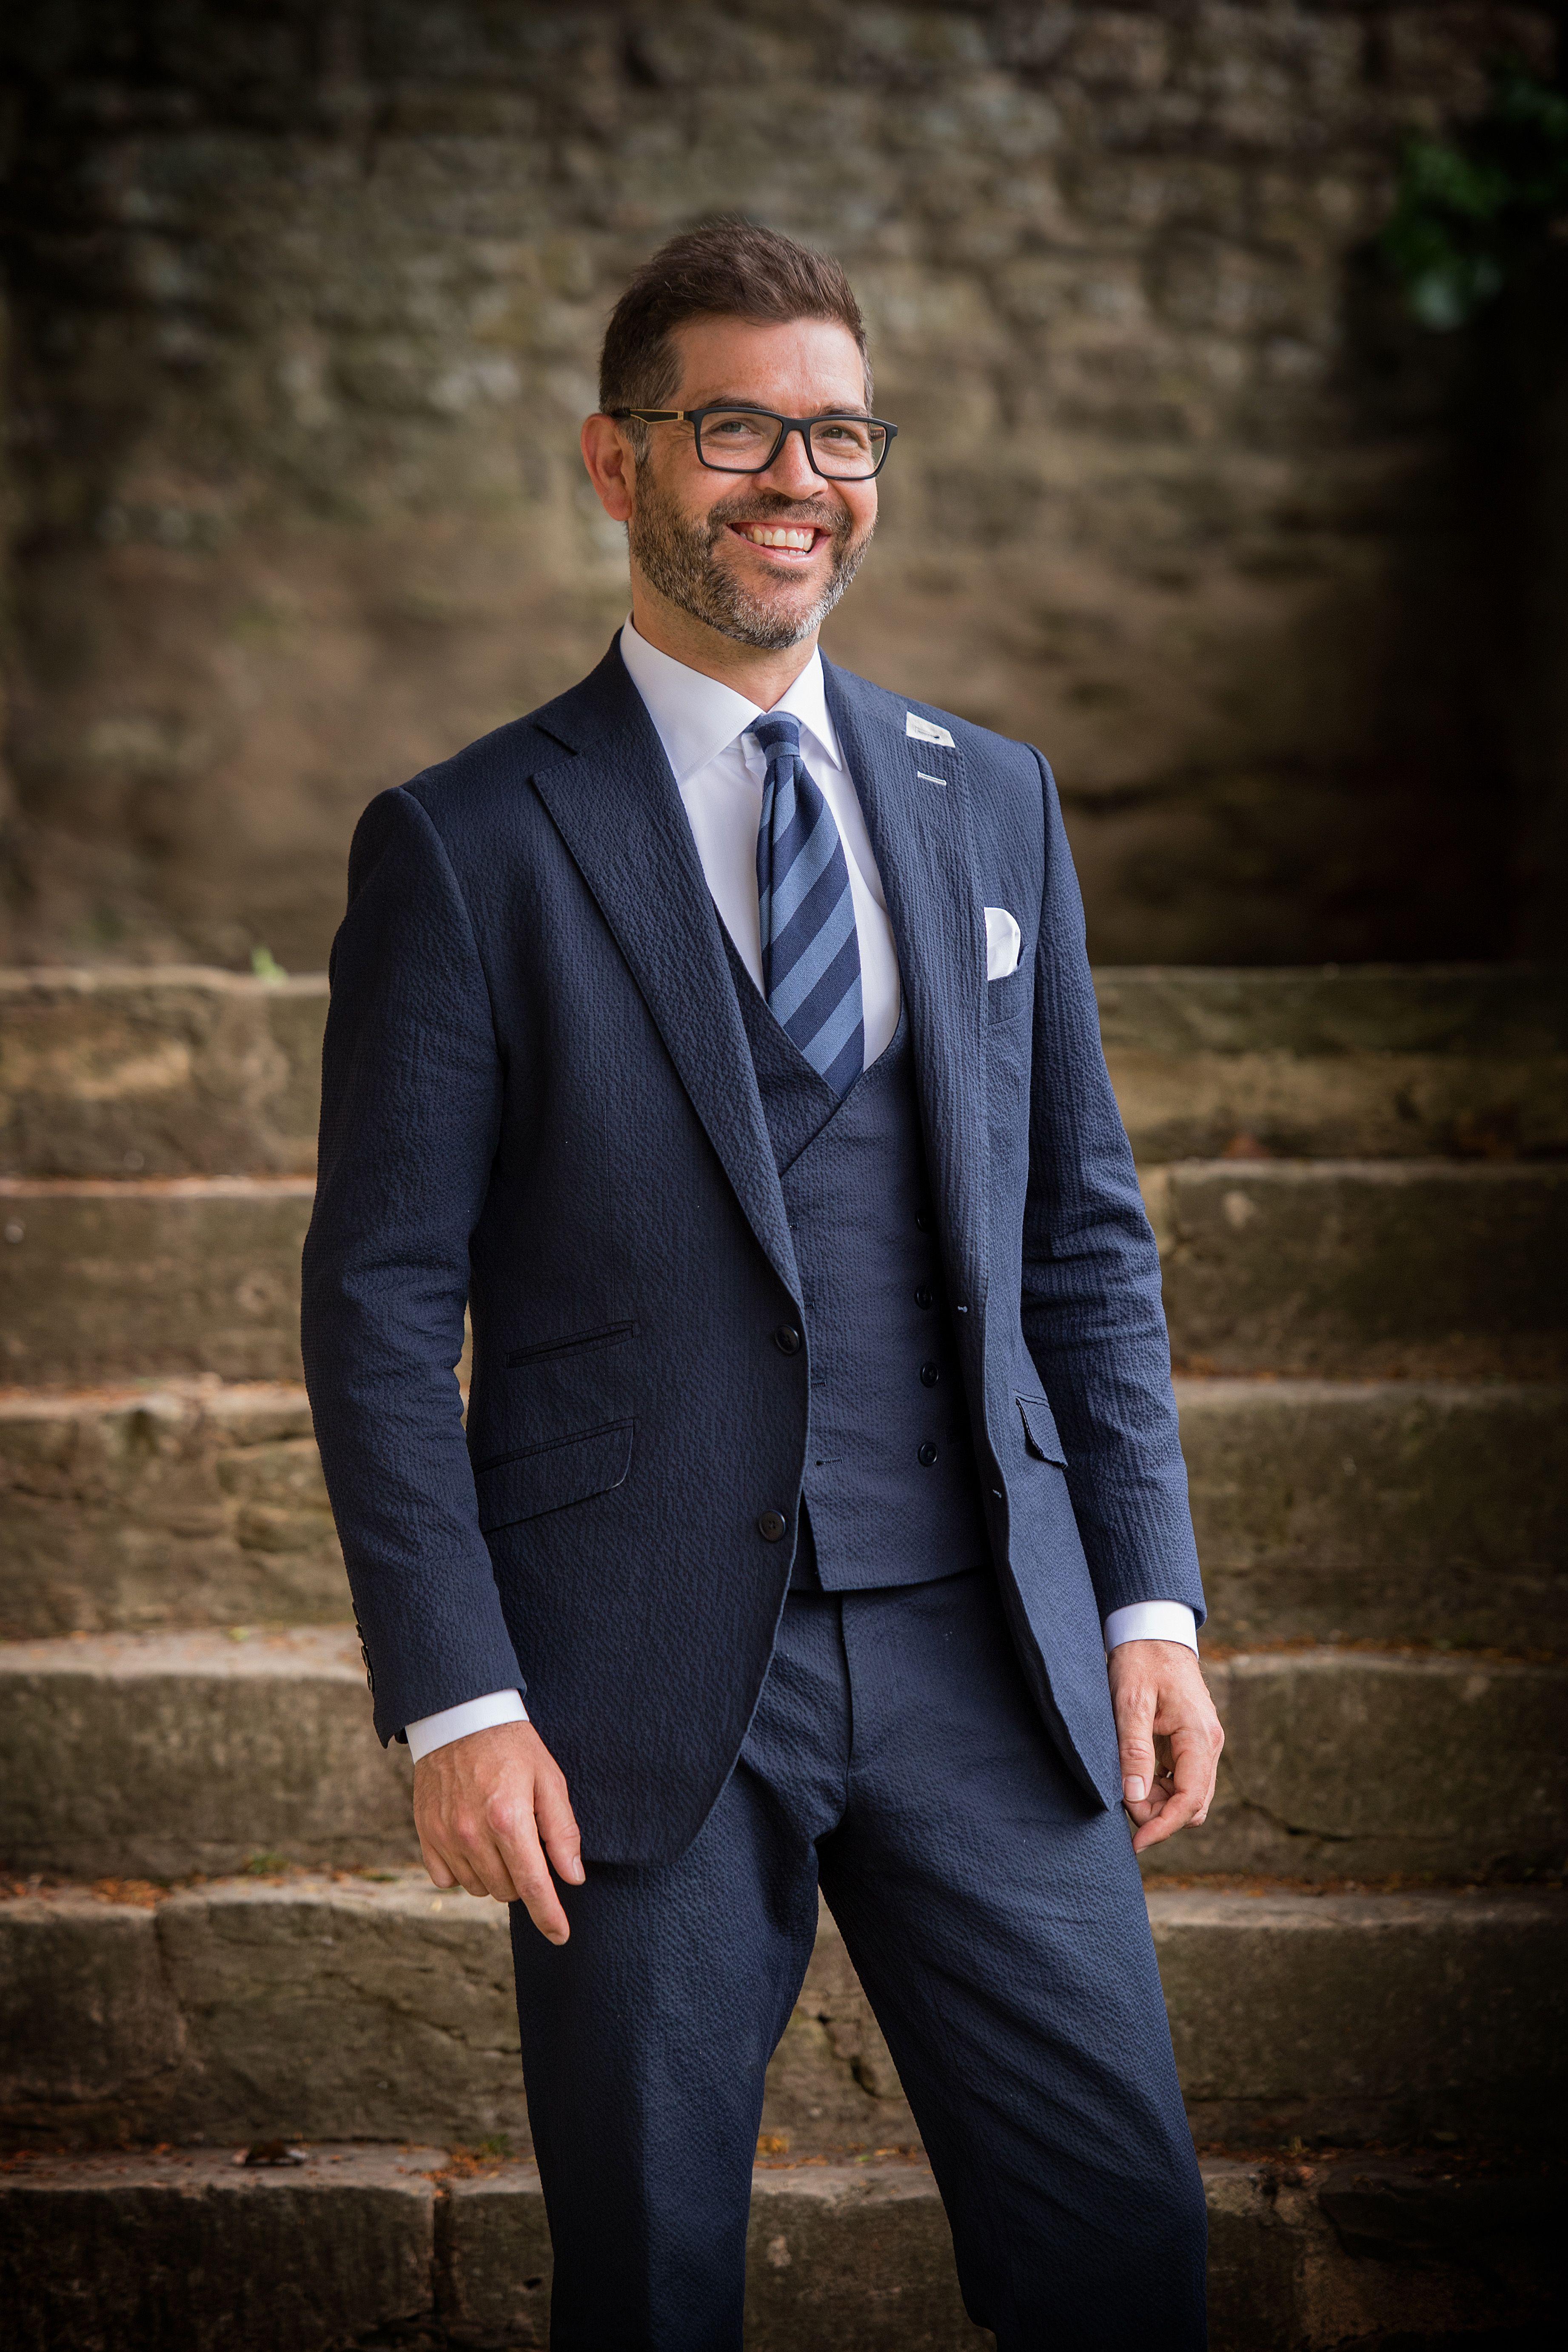 Summer Navy 3 piece suit in 2019 Summer wedding suits